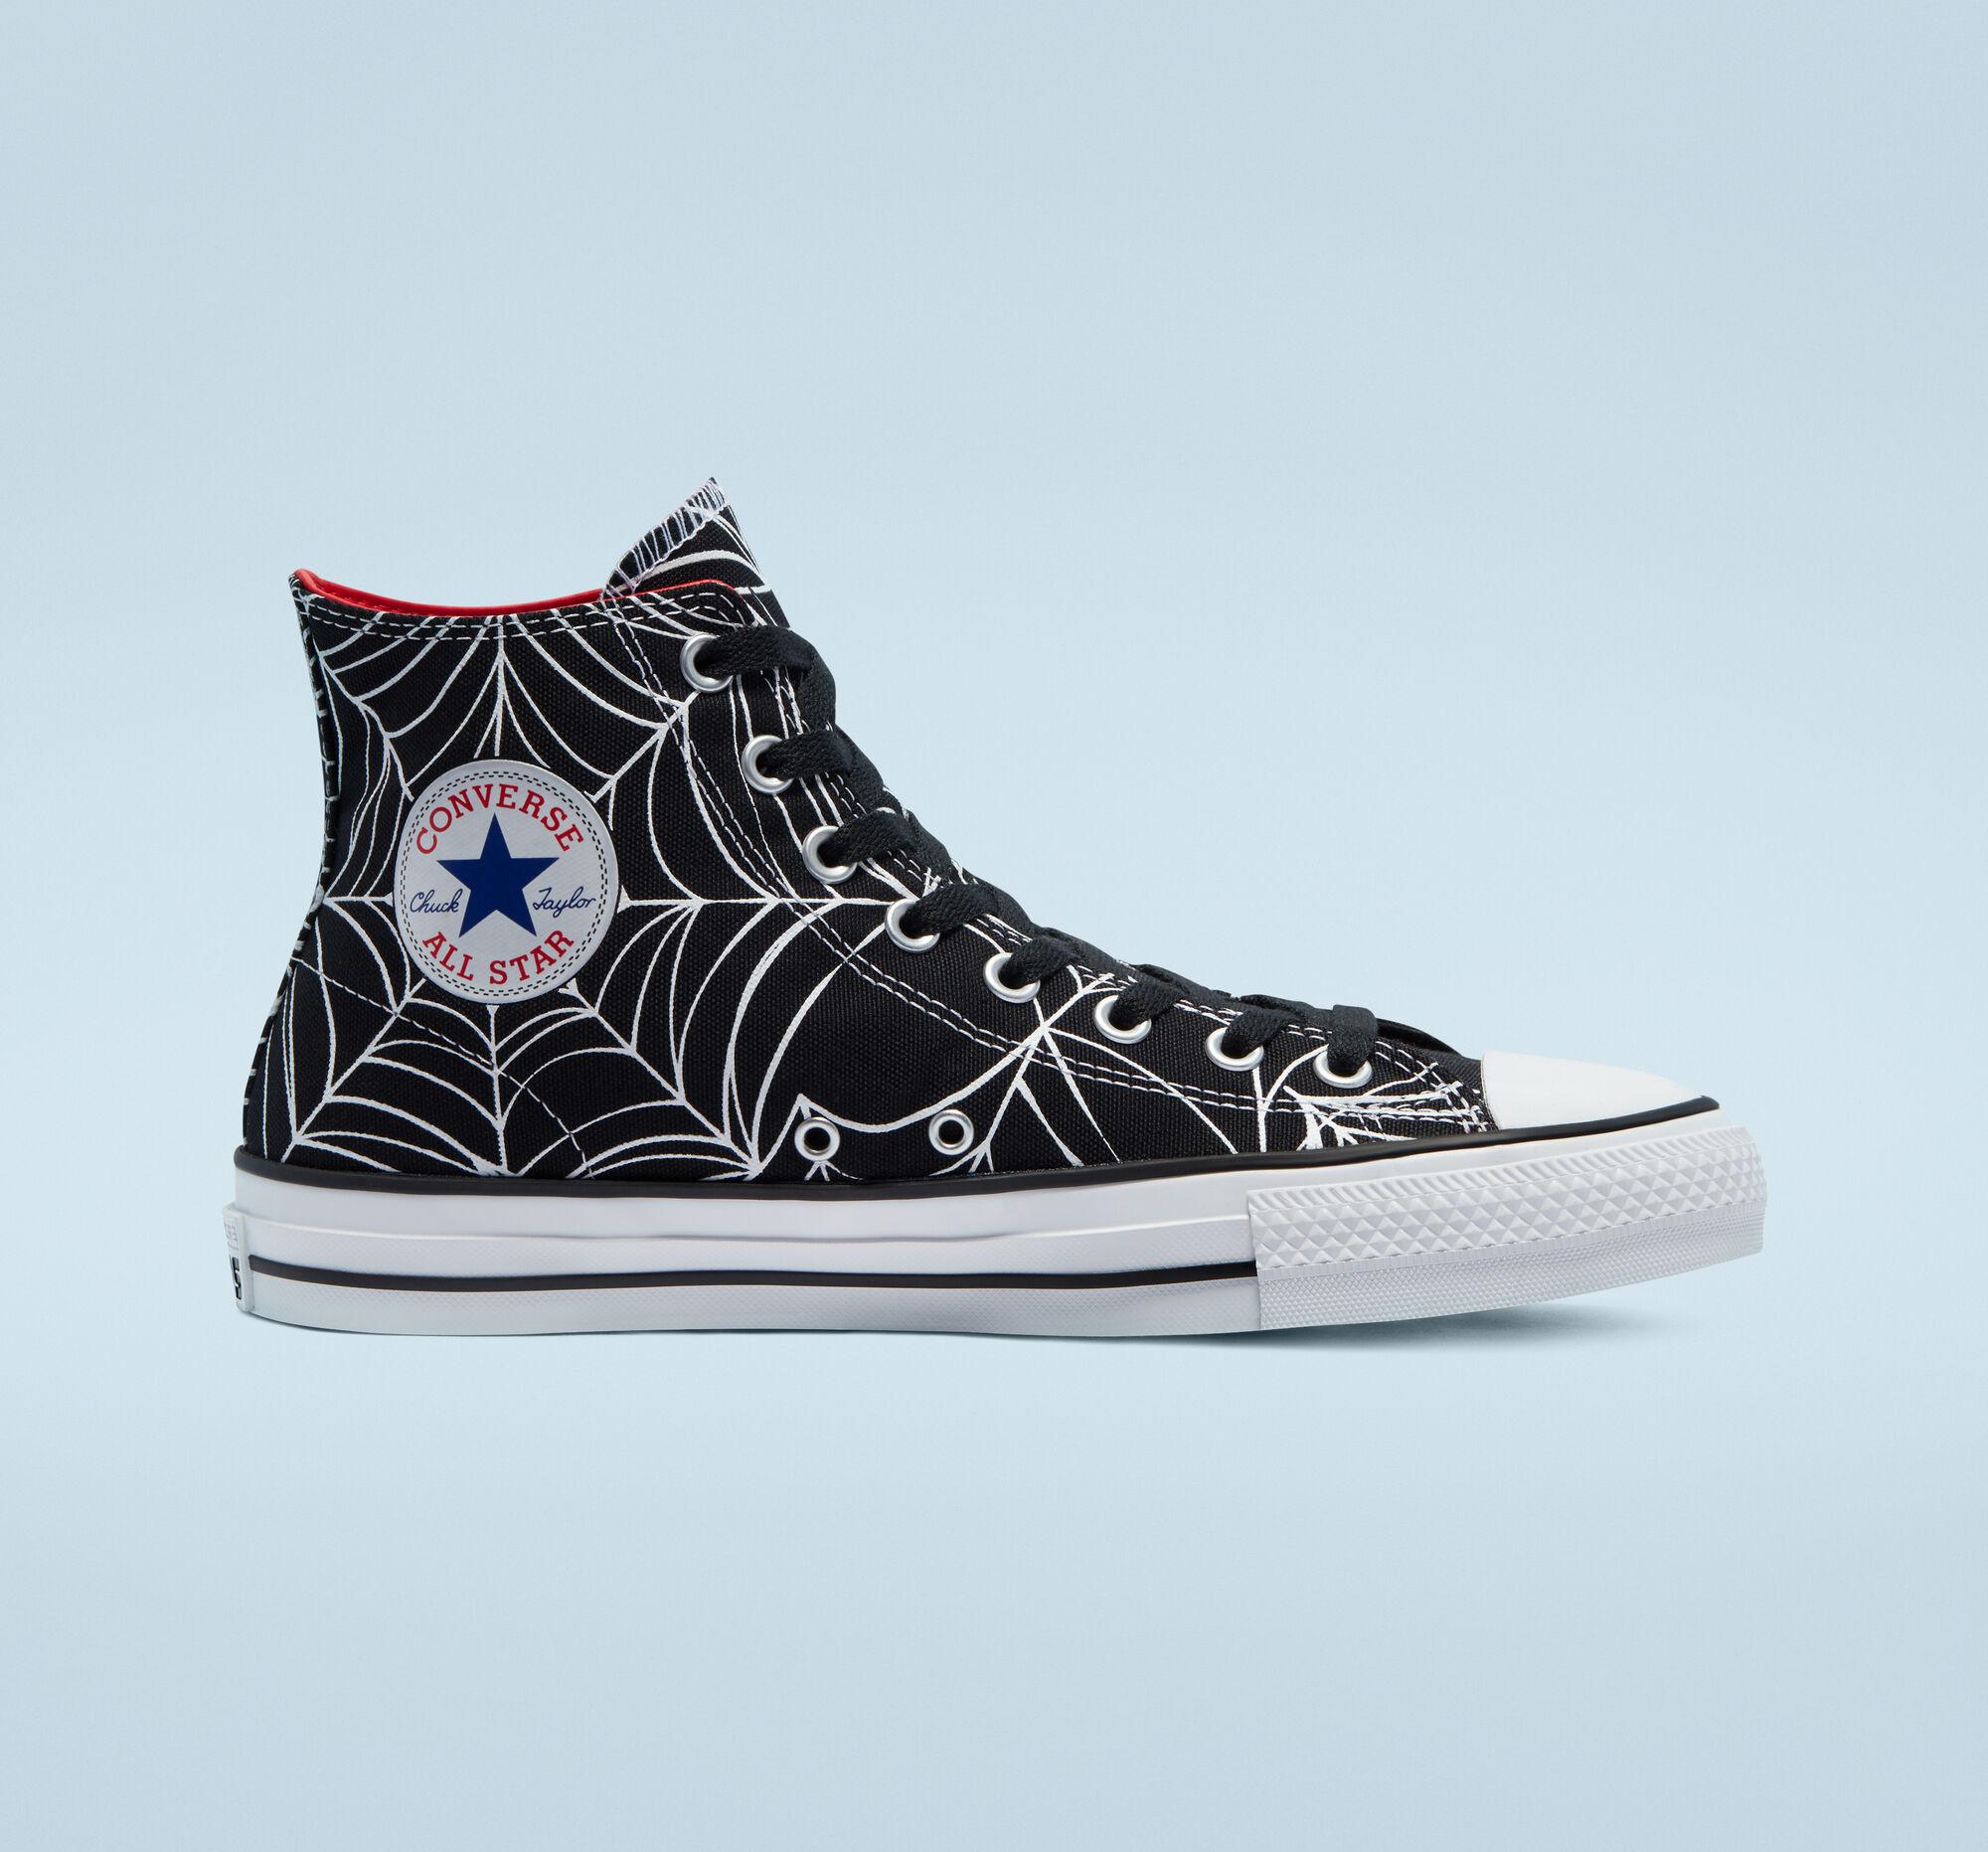 converse-chuck-taylor-all-star-pro-high-spider-web-milton-martinez-170938c10